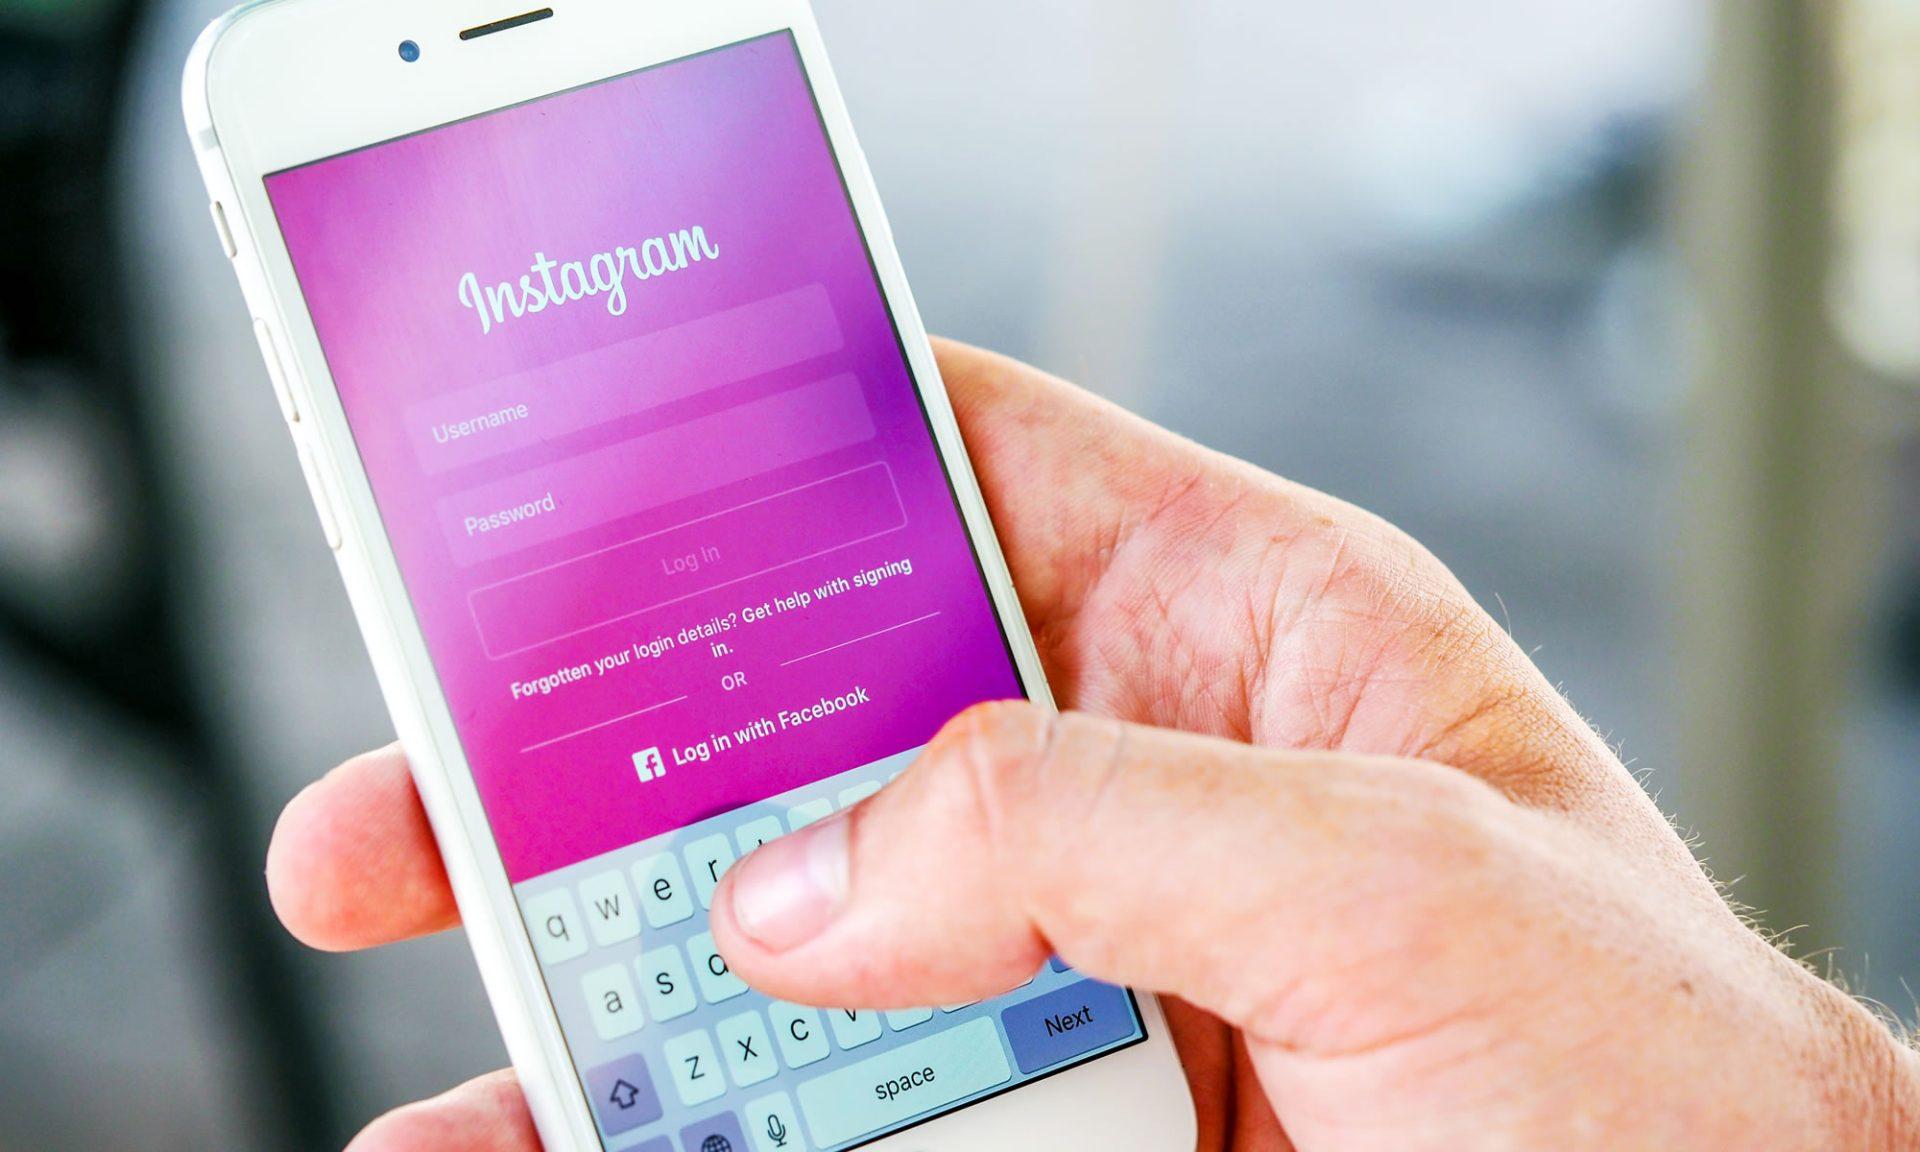 #WFMstagram: See What the Industry is Posting Online